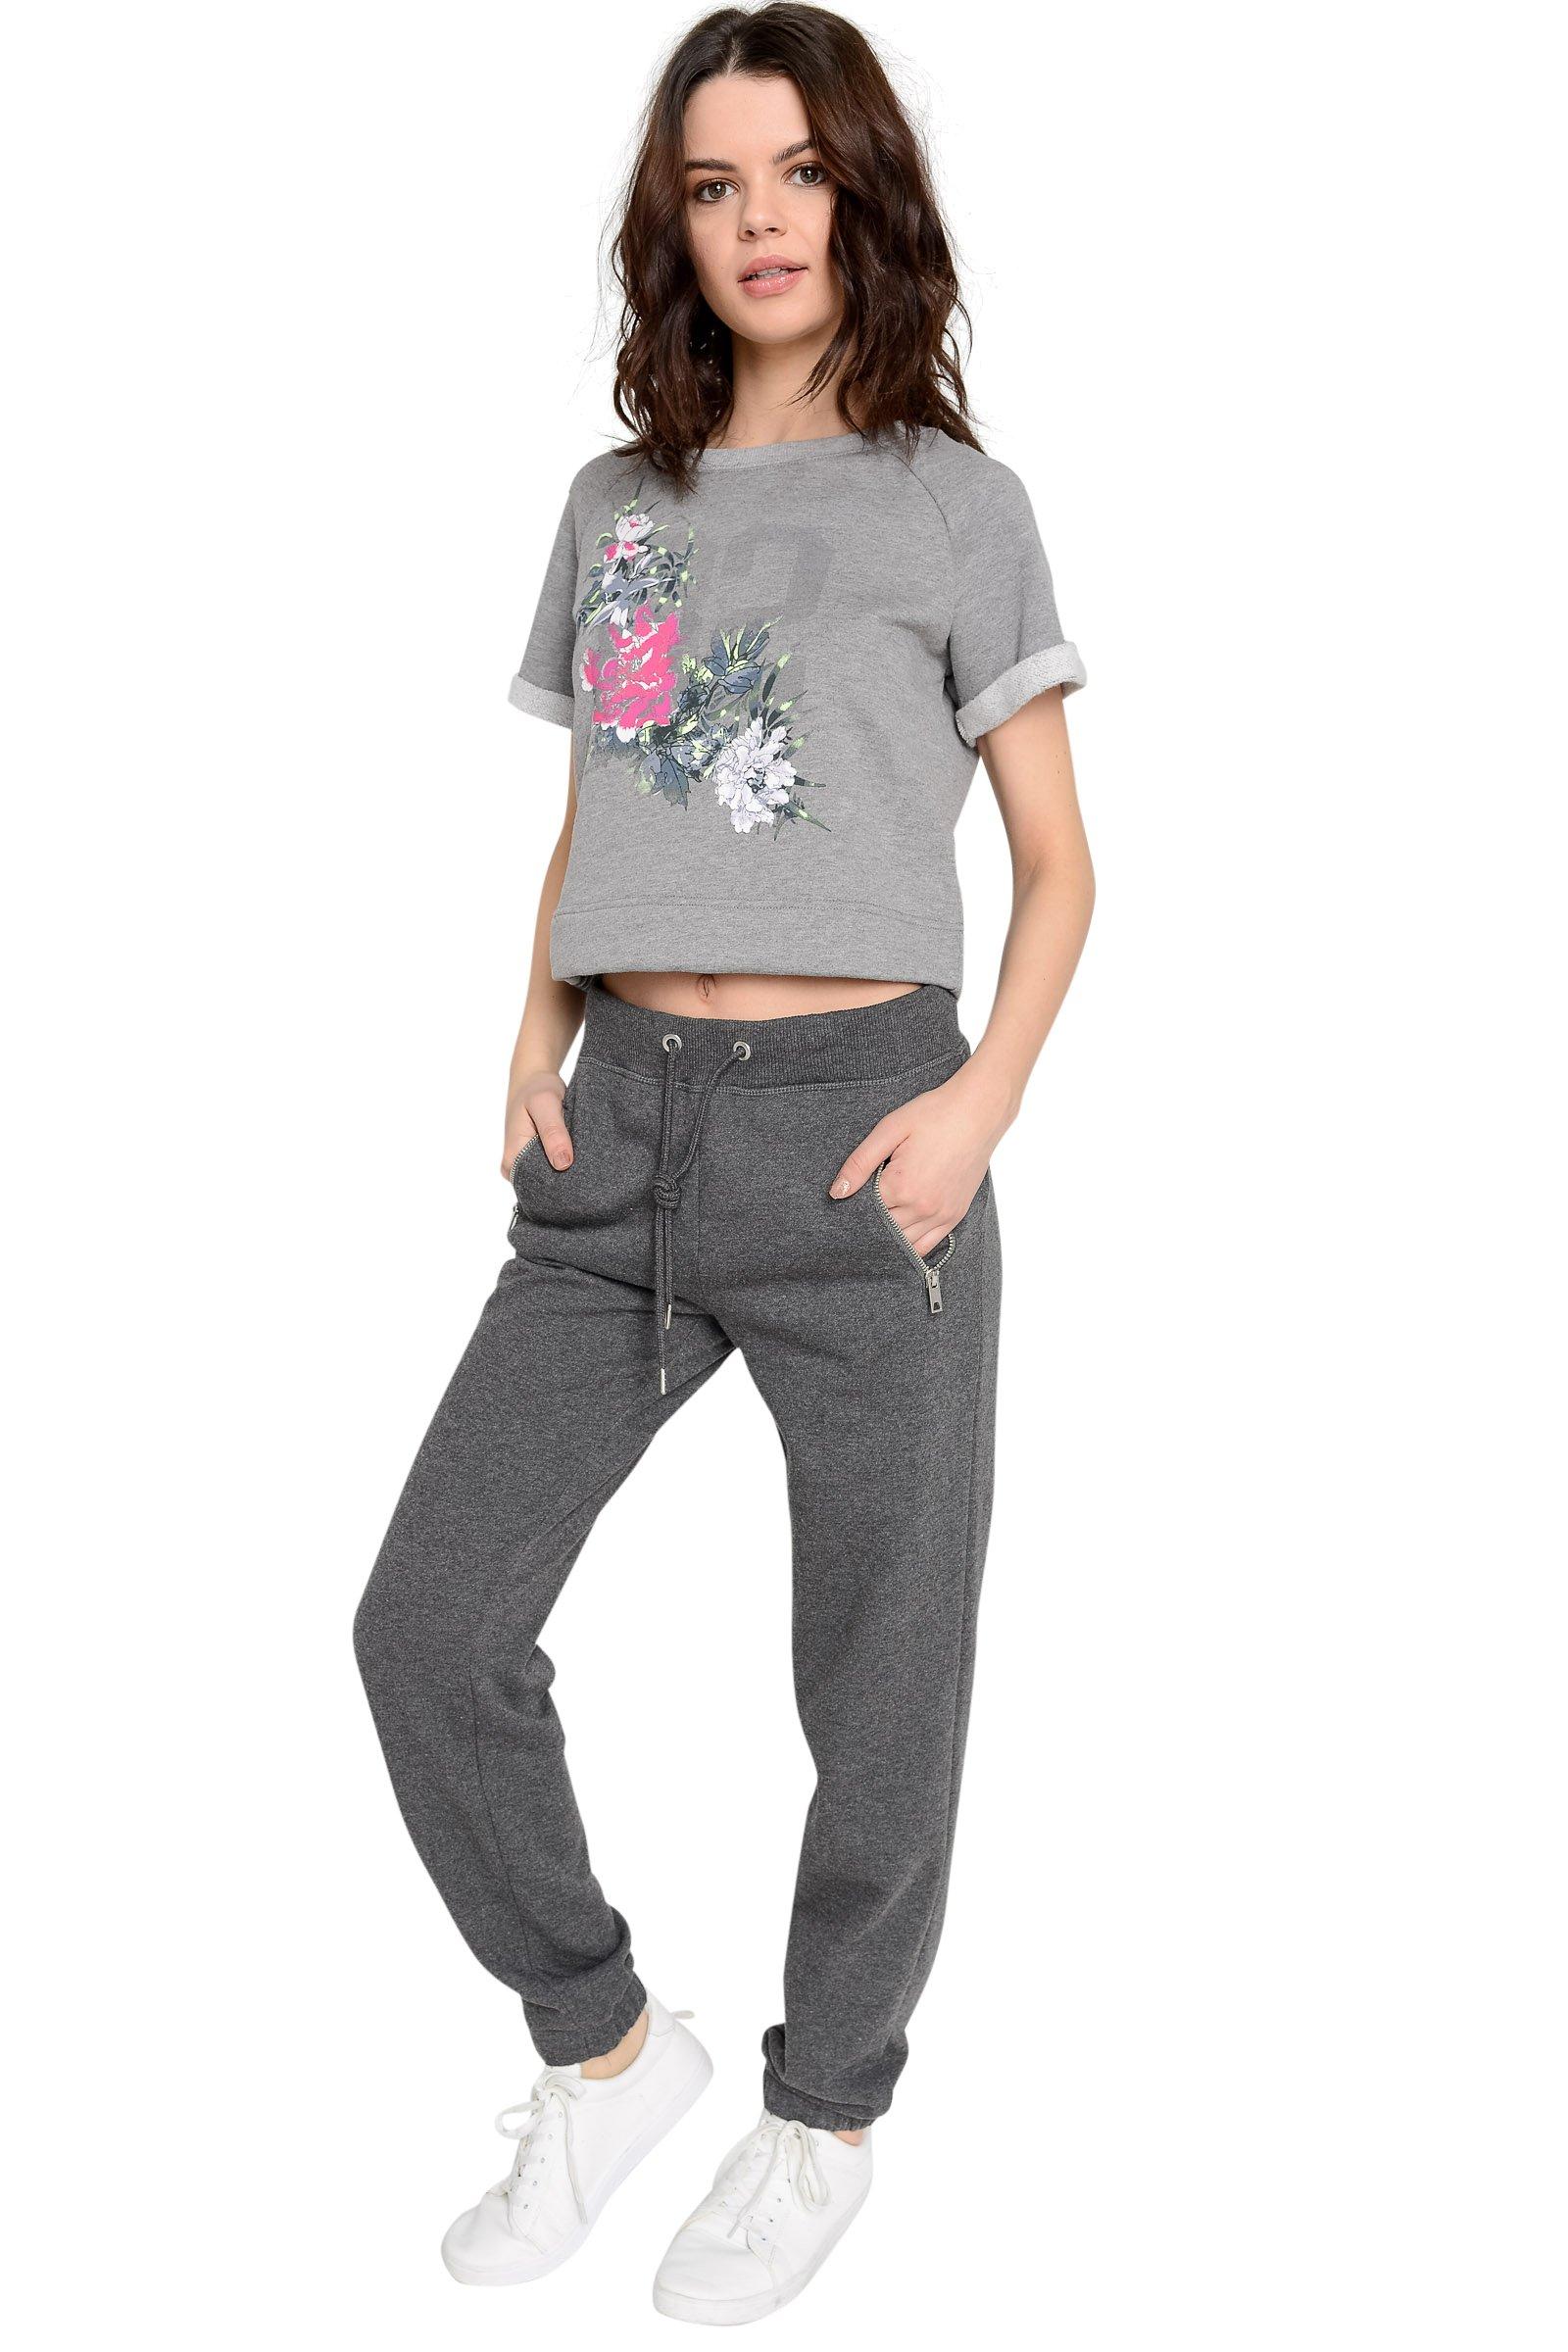 Ardene Women's - Sweatpants & Joggers - Fine Knit Sweatpants Small -(8A-AP01952)